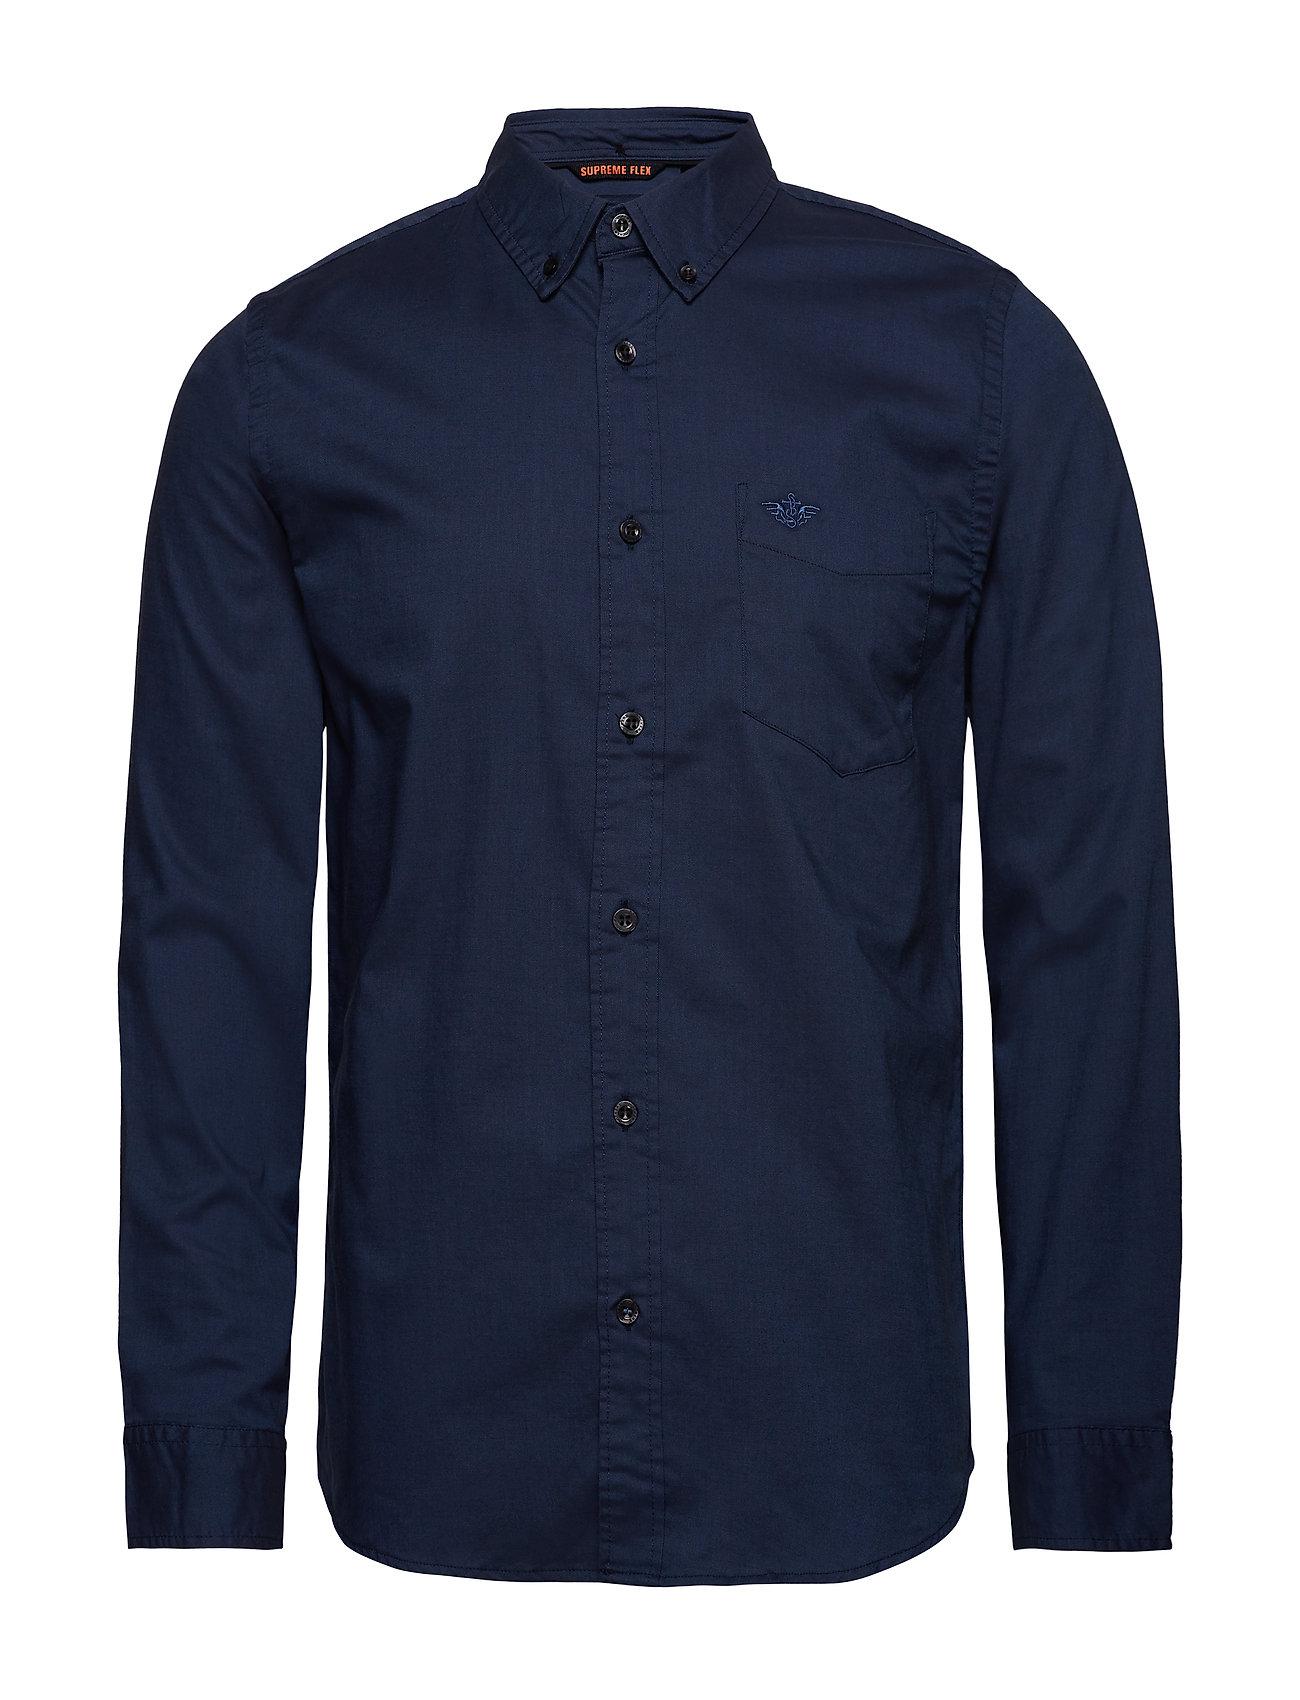 Shirt Oxford Sf Oxford StretchbluesDockers Sf Shirt derCxBWoQE